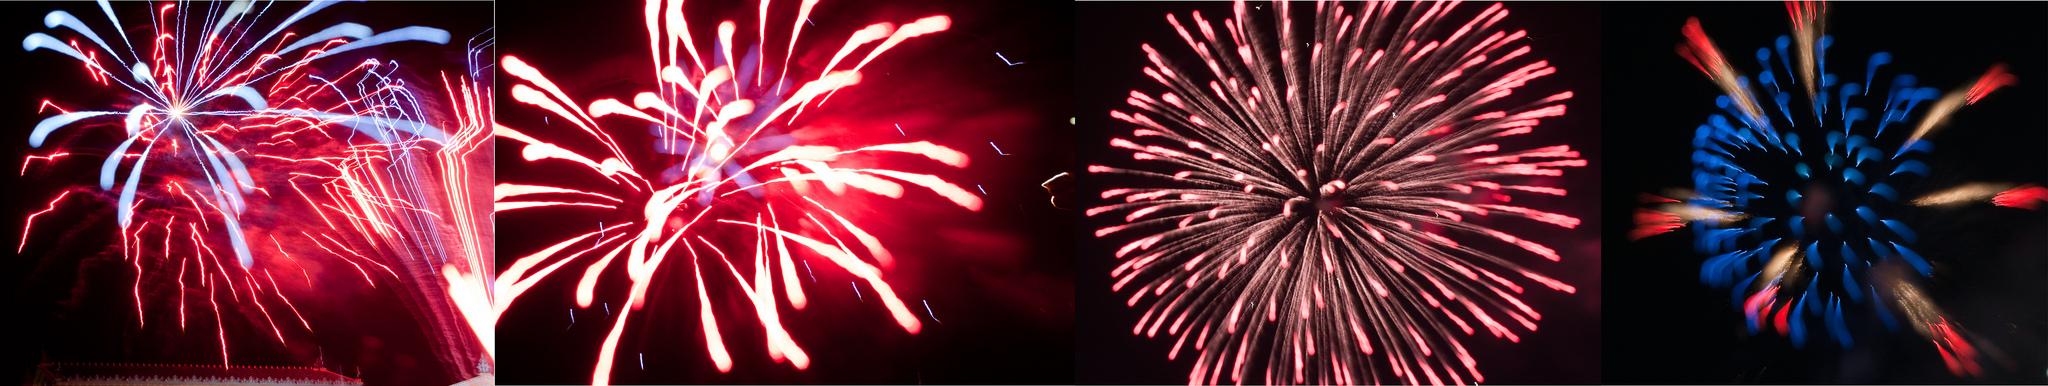 Defocussing Fireworks